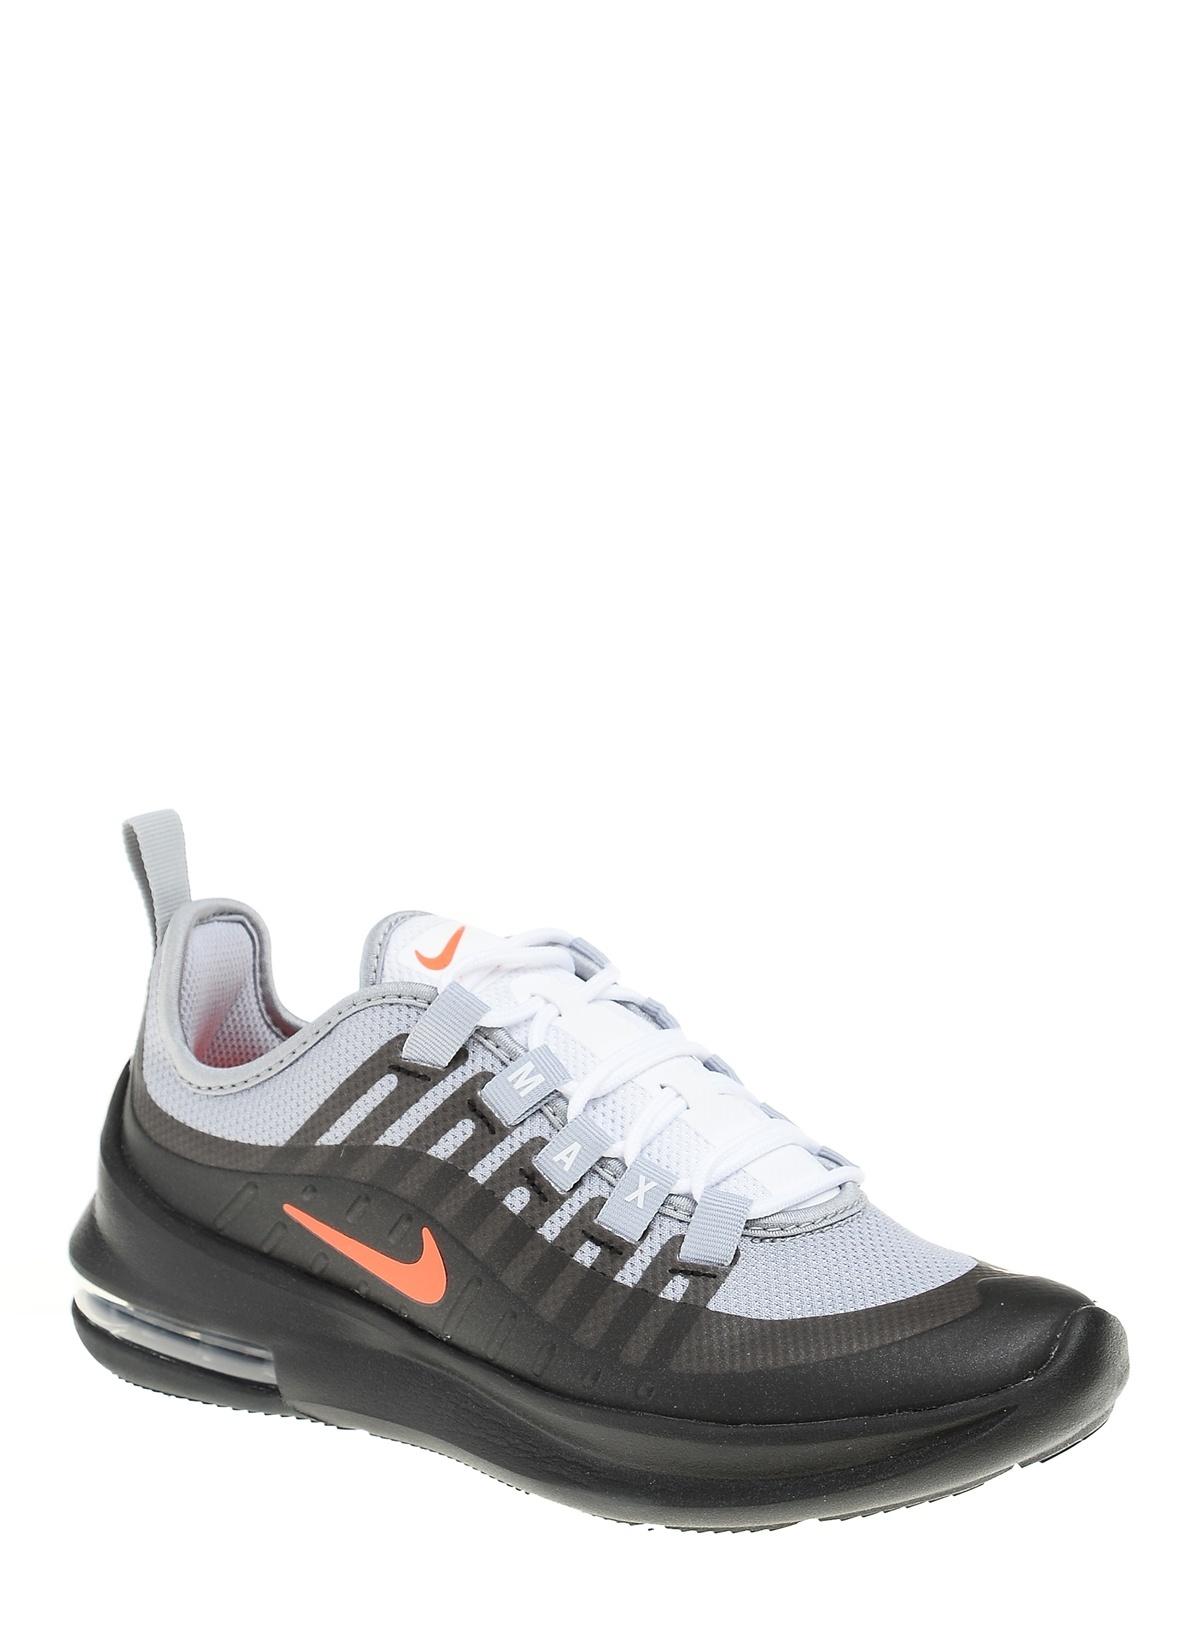 83723705c2d86 Nike Erkek Çocuk Air Max Axis Siyah/Gri/Gümüş | Morhipo | 21326603